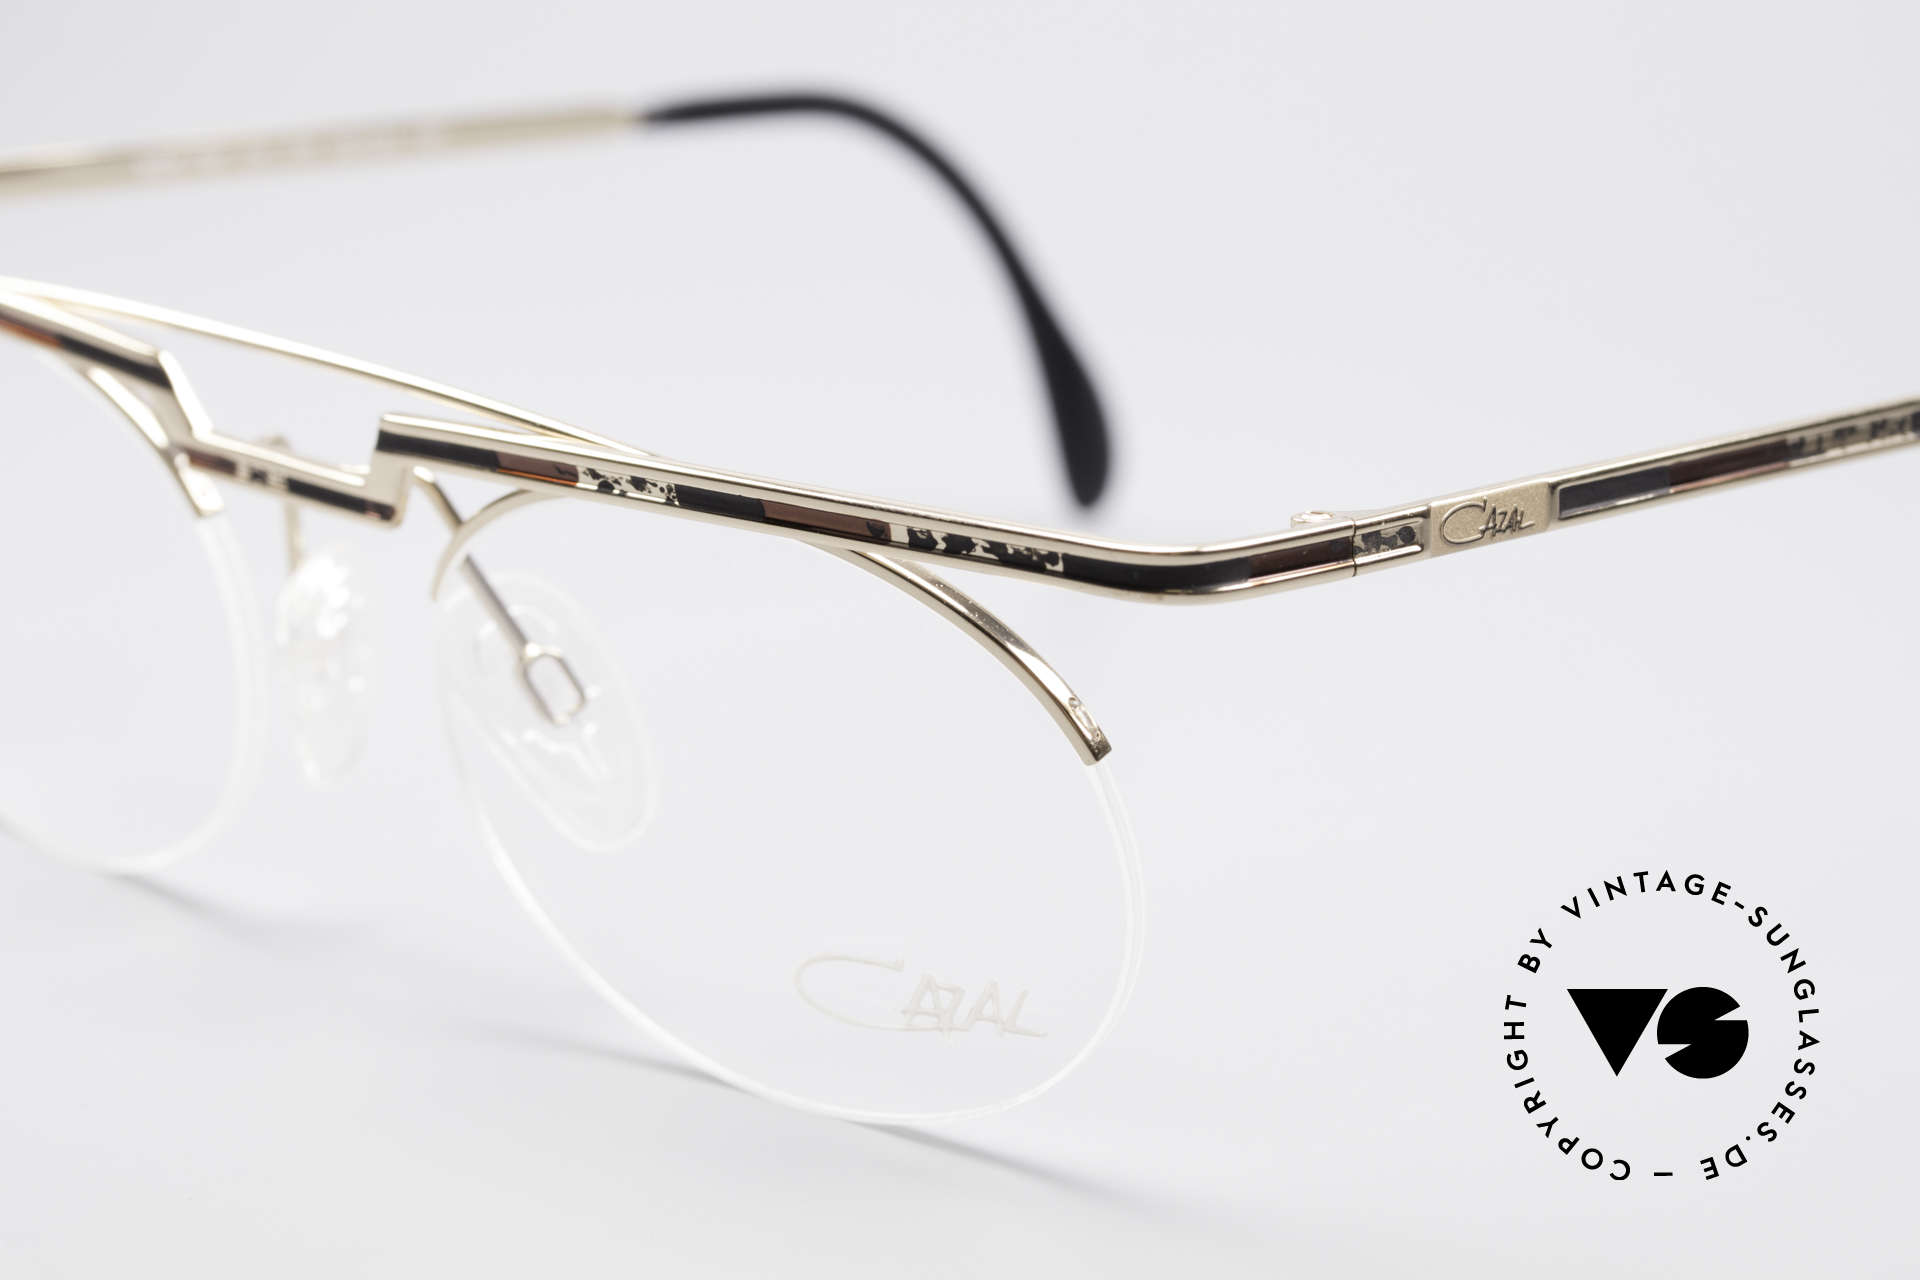 "Cazal 758 Original 90s Vintage Glasses, color description in the old catalog: ""gold brown-black"", Made for Men and Women"